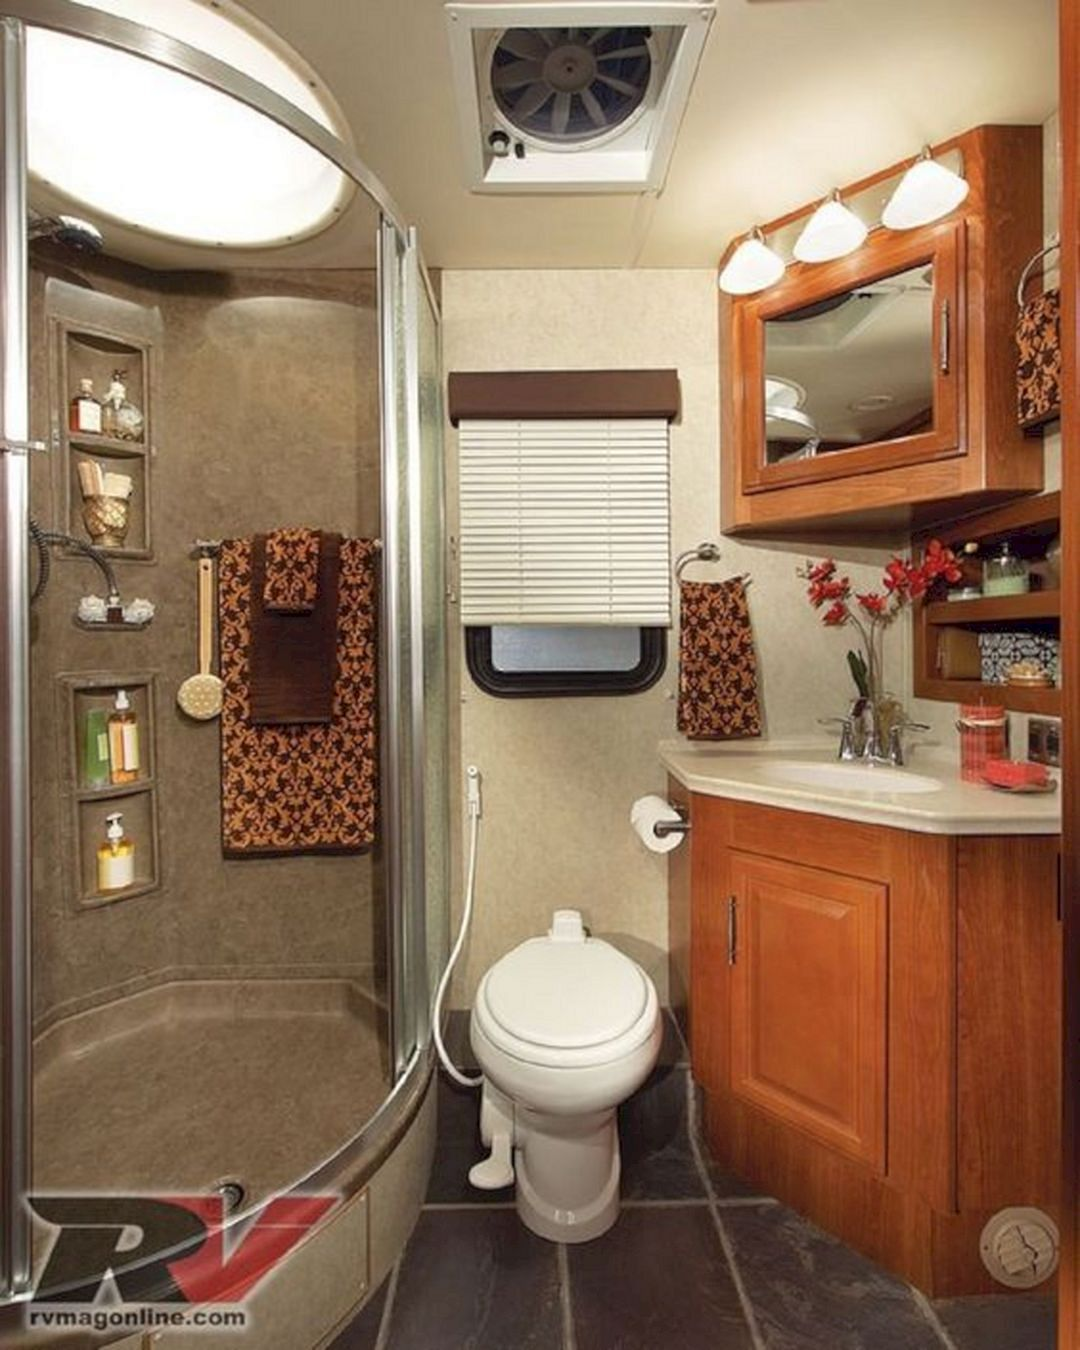 Top 39 Best Rv Bathroom Collections For Rv Bathroom Remodelling Inspirations Https Decoor Net 39 Best Rv Bathroom Rv Bathroom Toilet Remodel Camper Bathroom